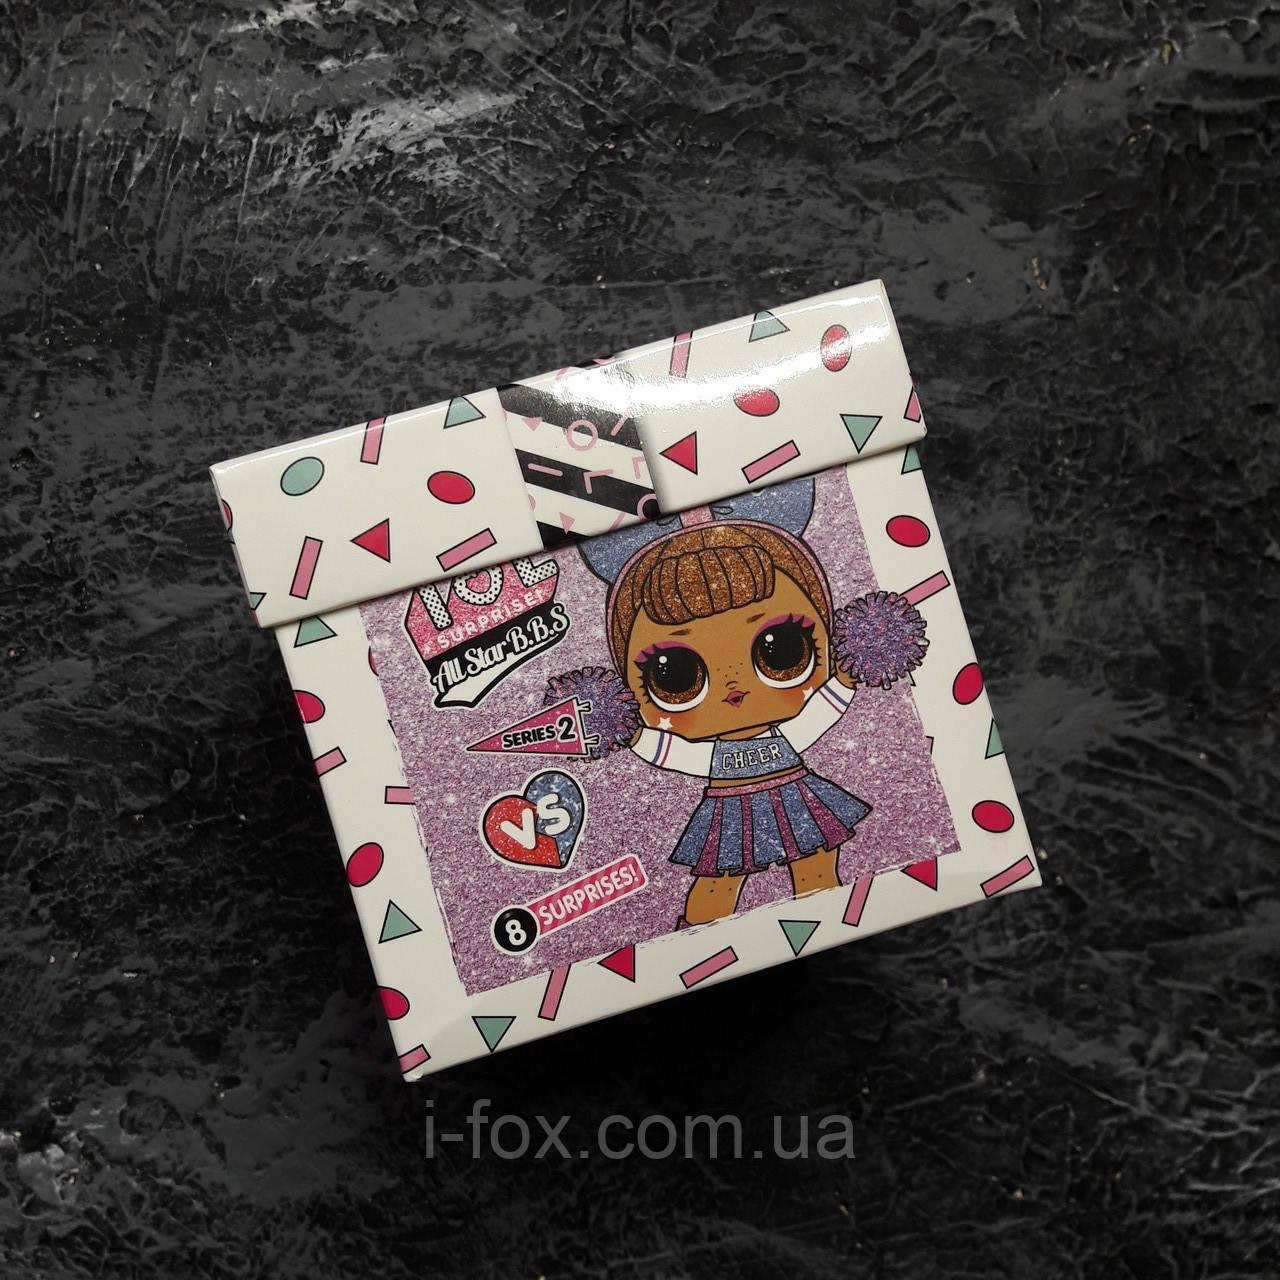 Подарок в коробке блестящая кукла глиттер шар ЛОЛ | L.O.L. Surprise 8 Surprises LOL